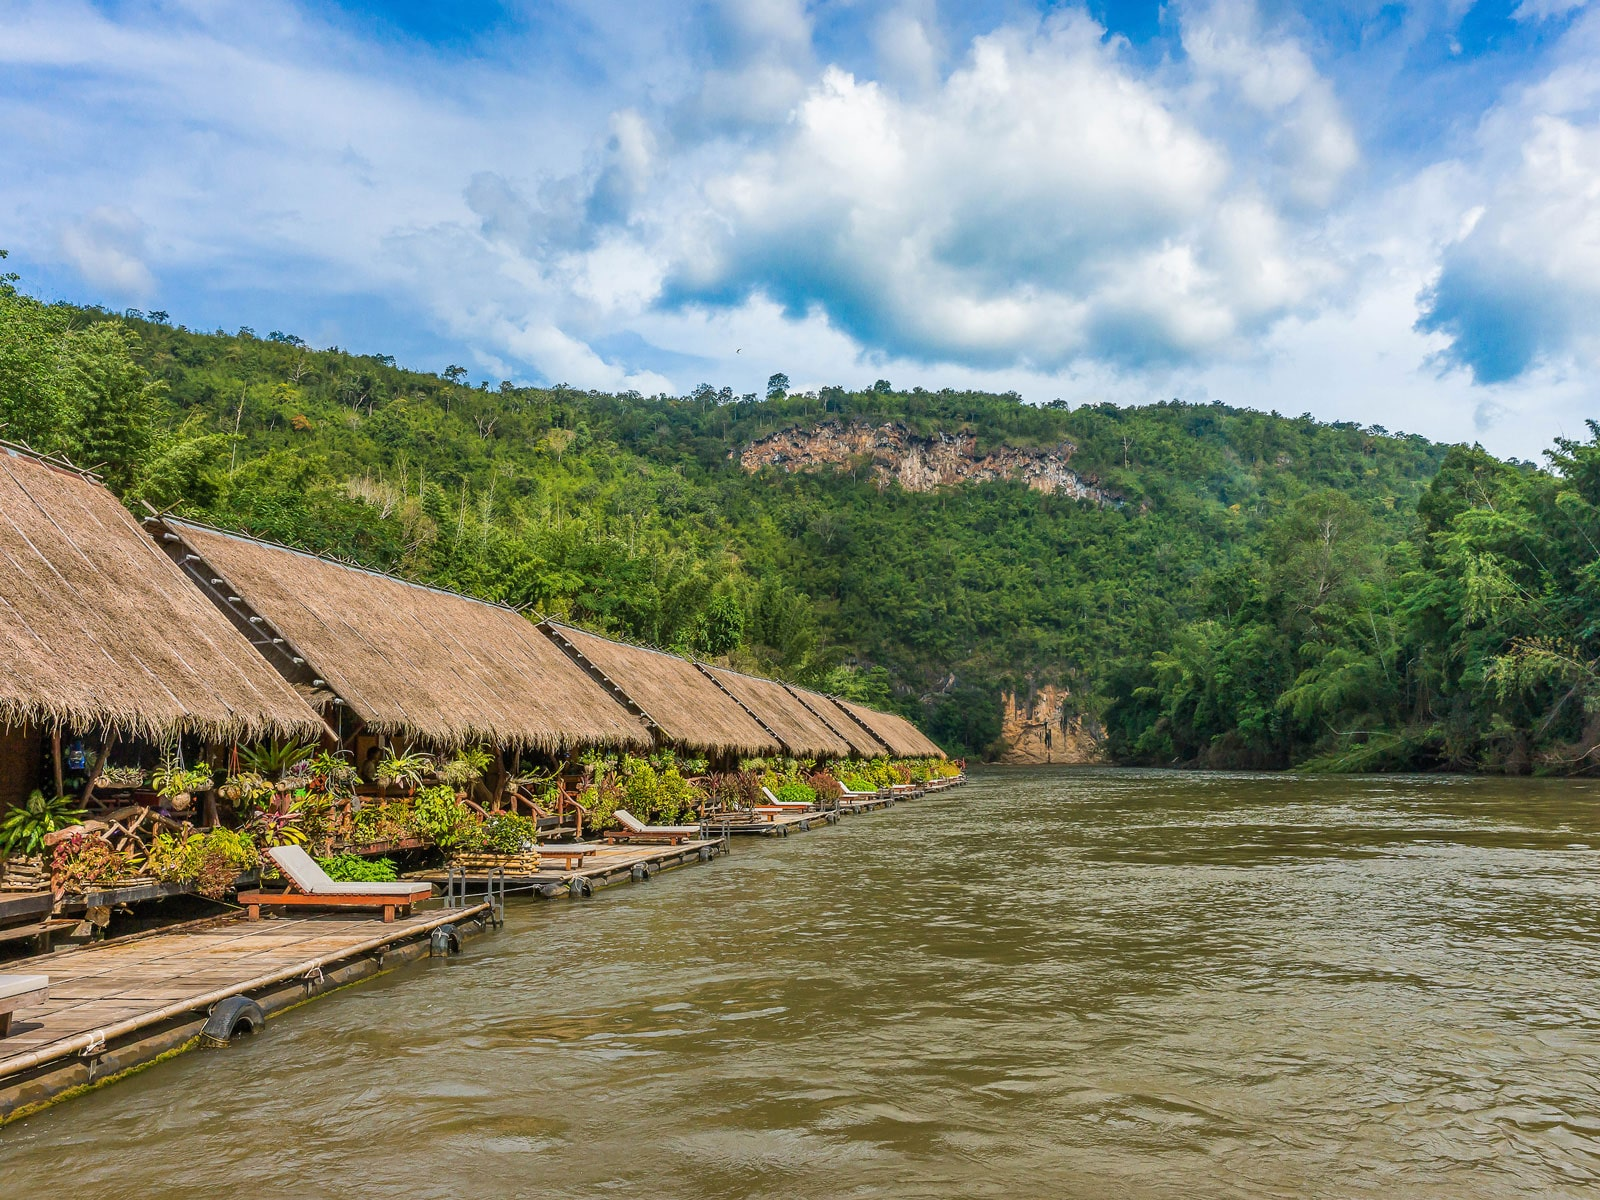 rondreis thailand kanchanaburi jungle rafts river kwai blog 3